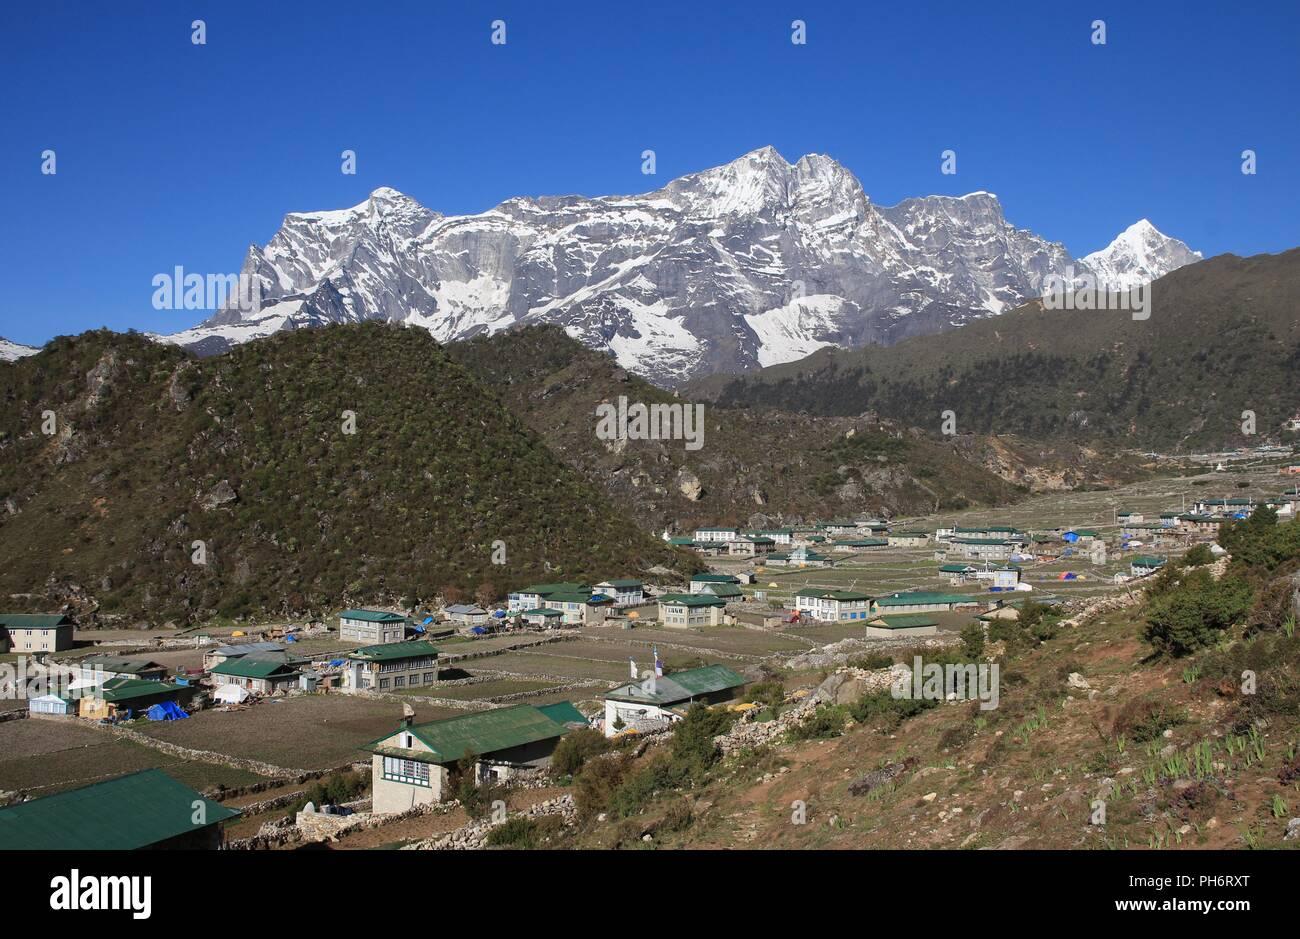 Khumjung, Sherpa village in the Everest National Park - Stock Image